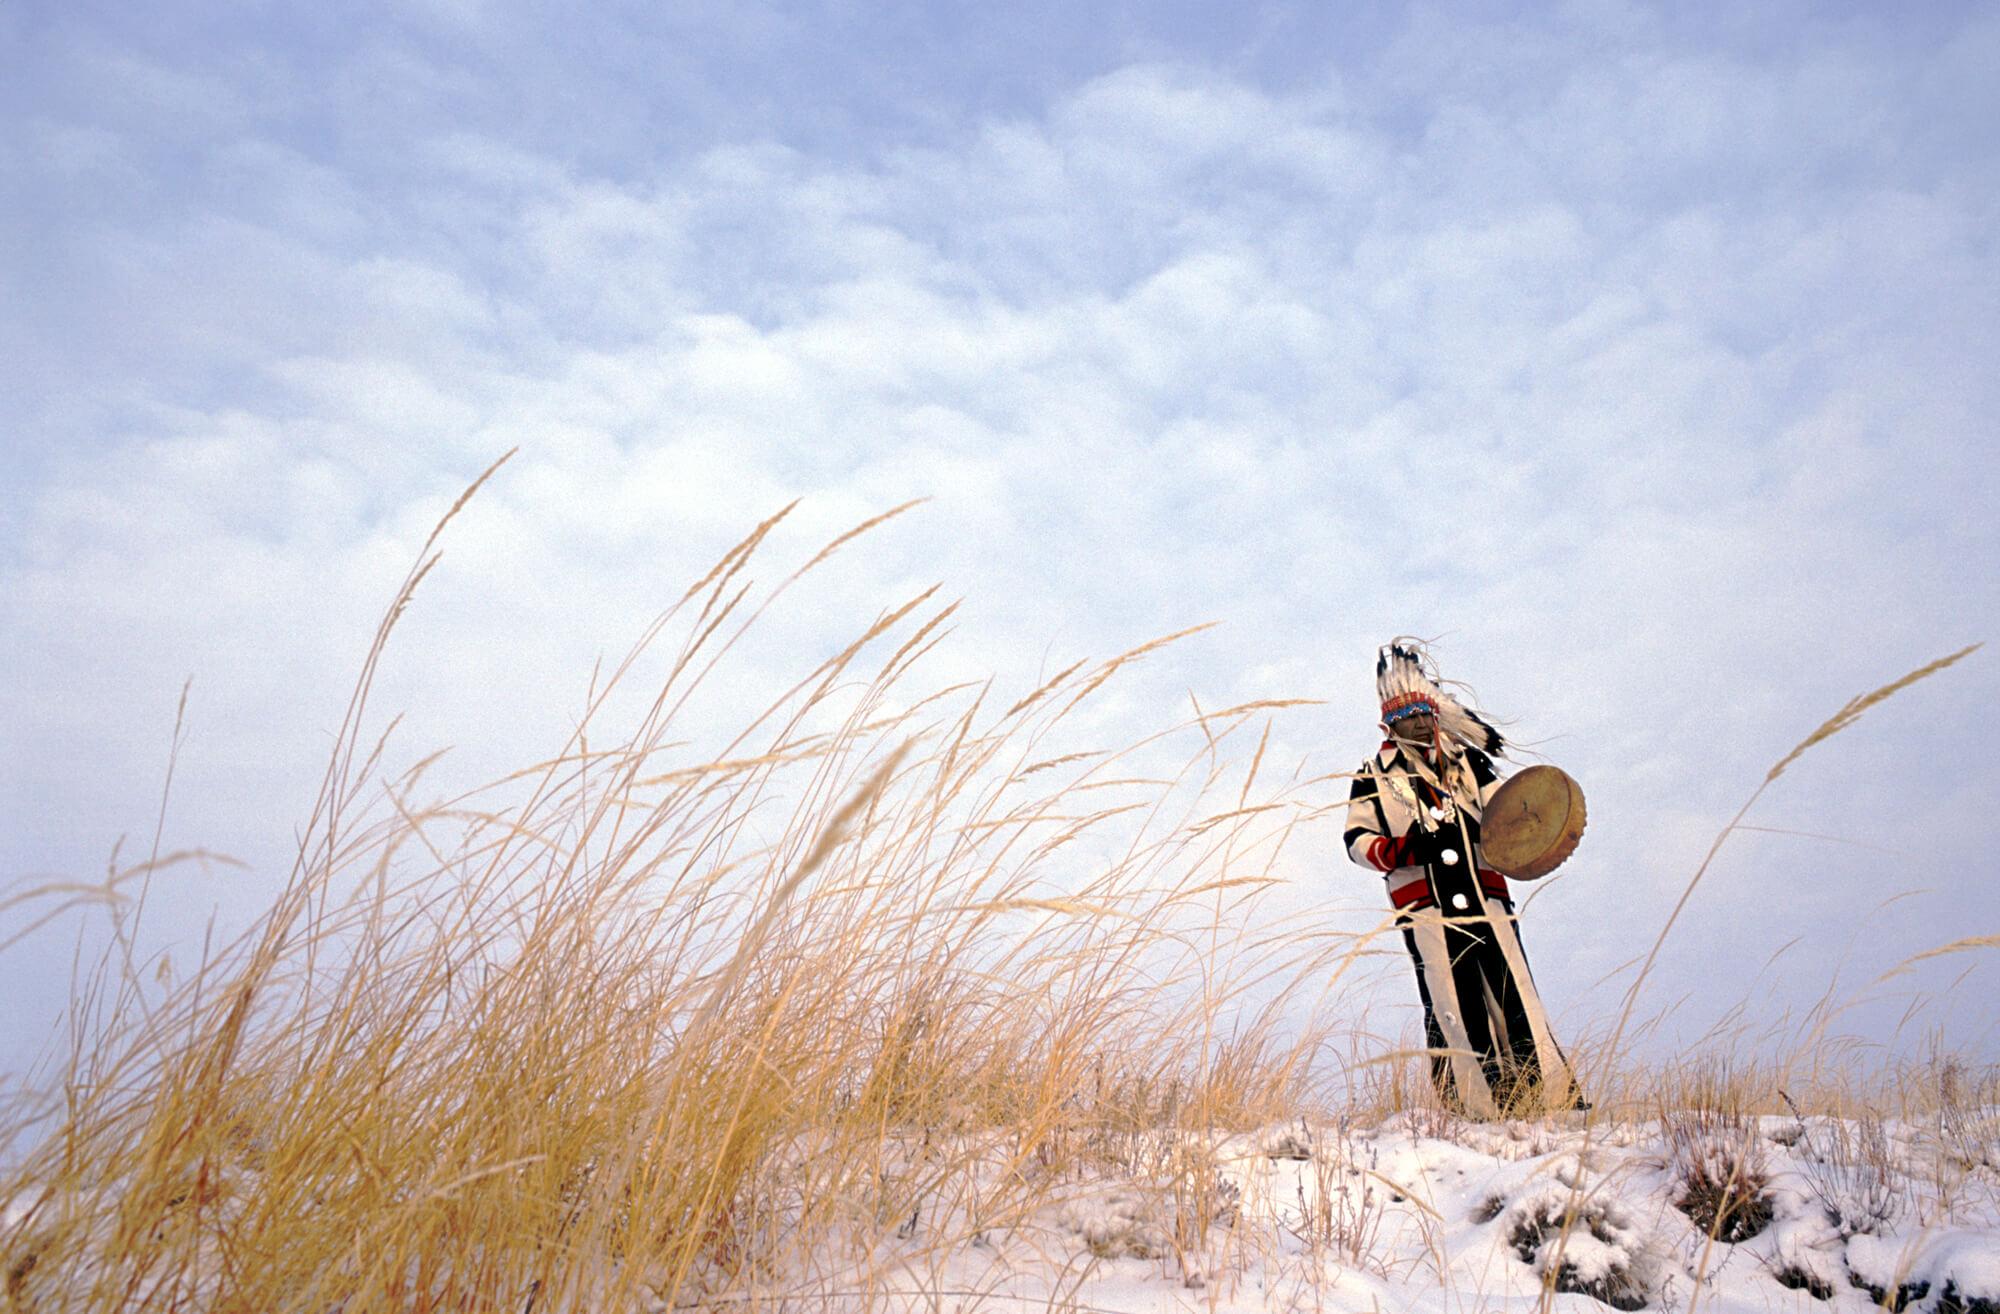 Steber_Praying-over-the-Land-Lakota